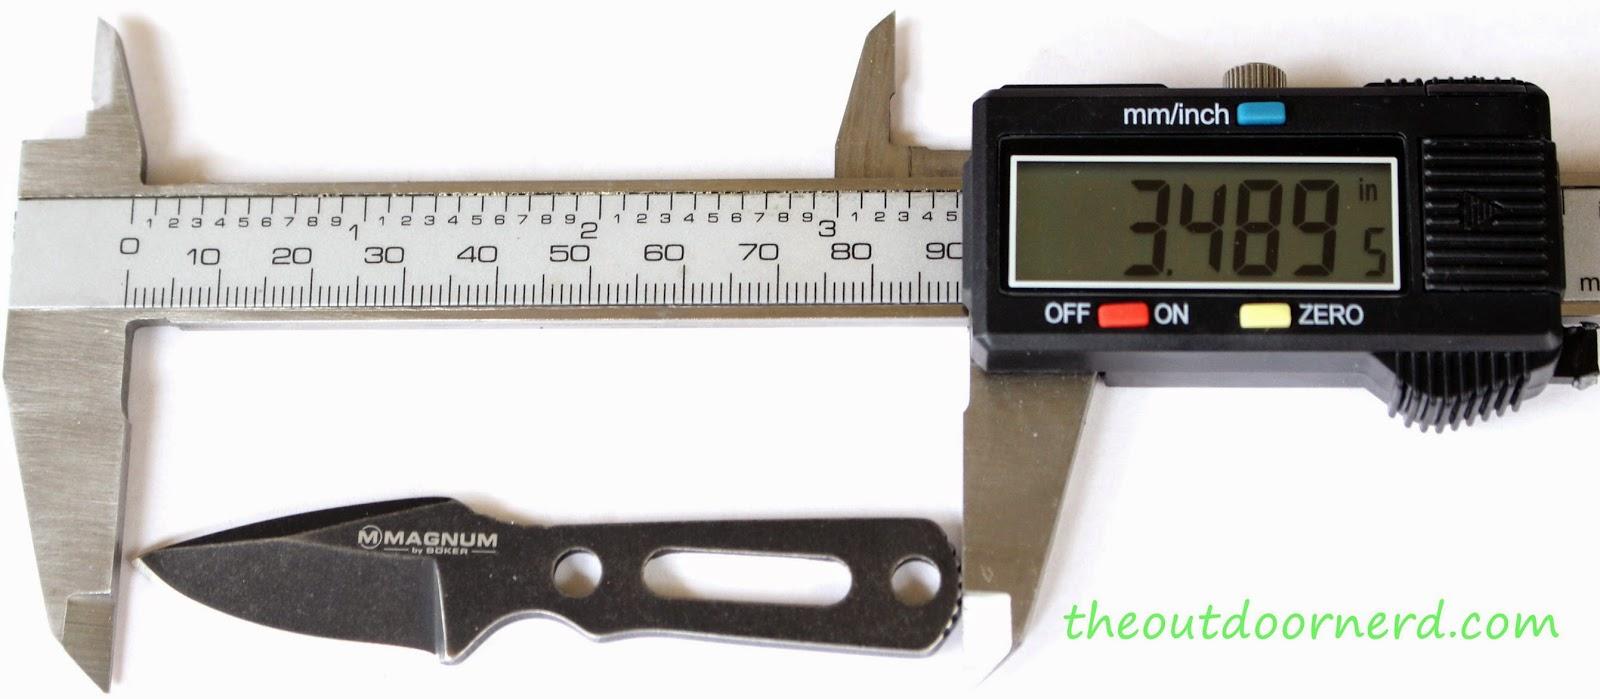 Boker Magnum 'Lil Friend' Arrowhead: Caliper Measurement 2